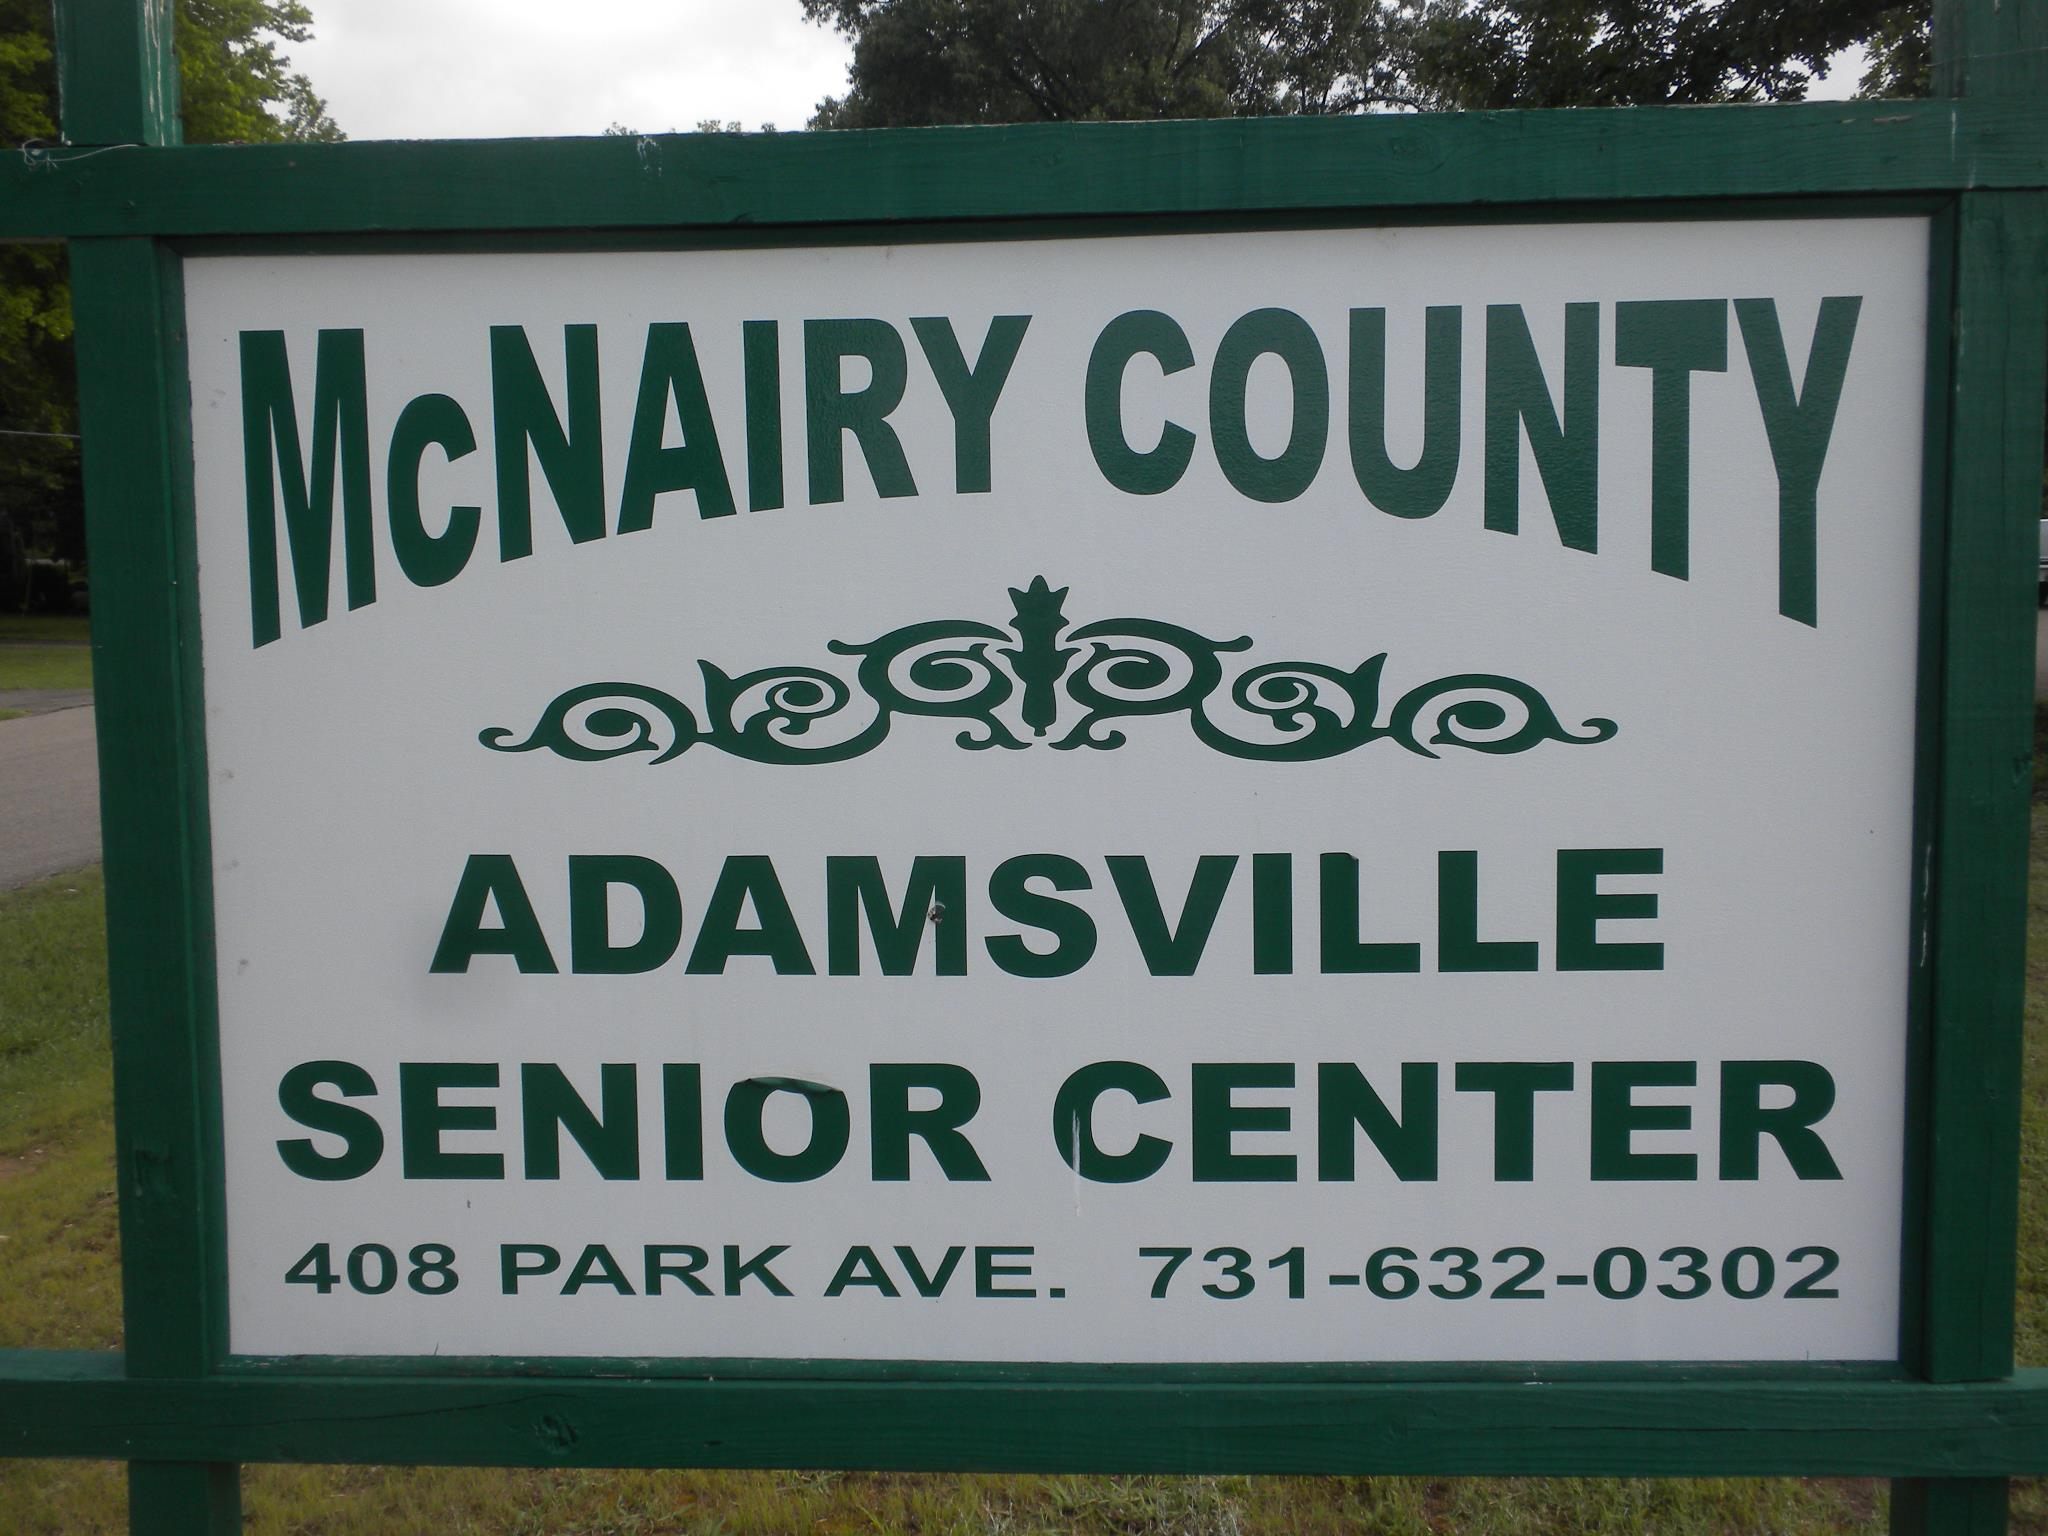 McNairy County Senior Center